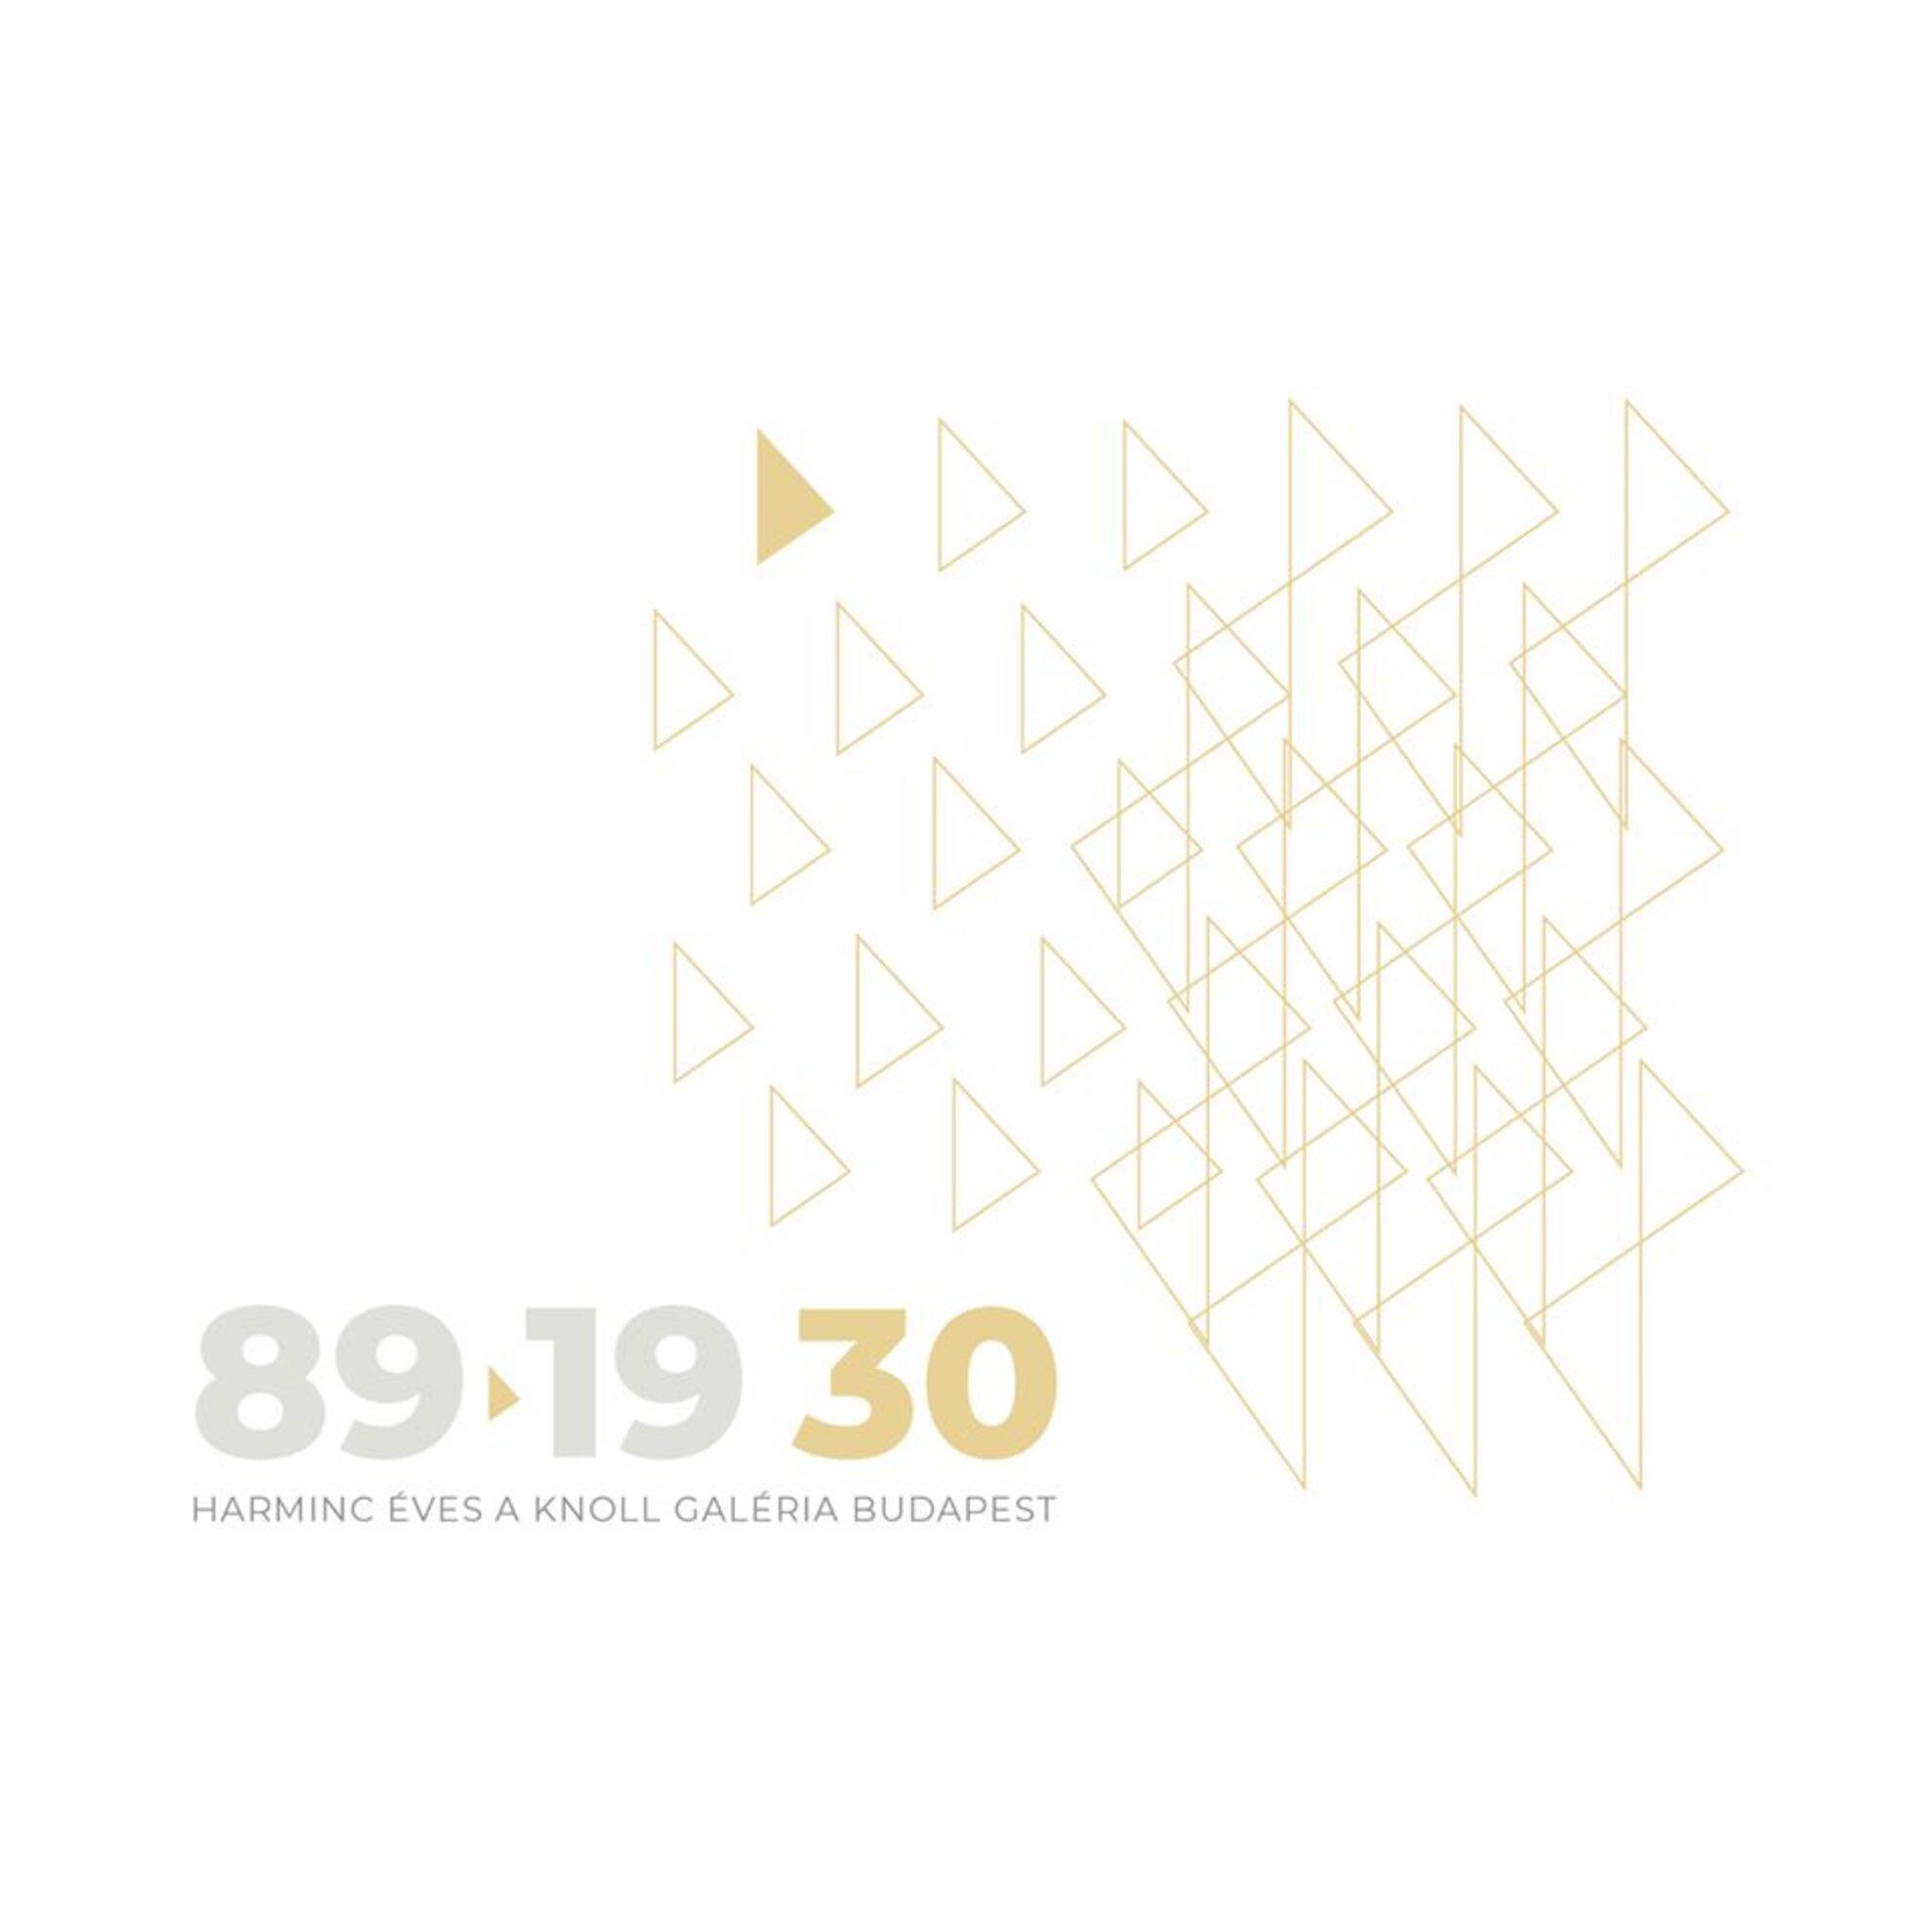 30 éves a Knoll Galéria Budapest